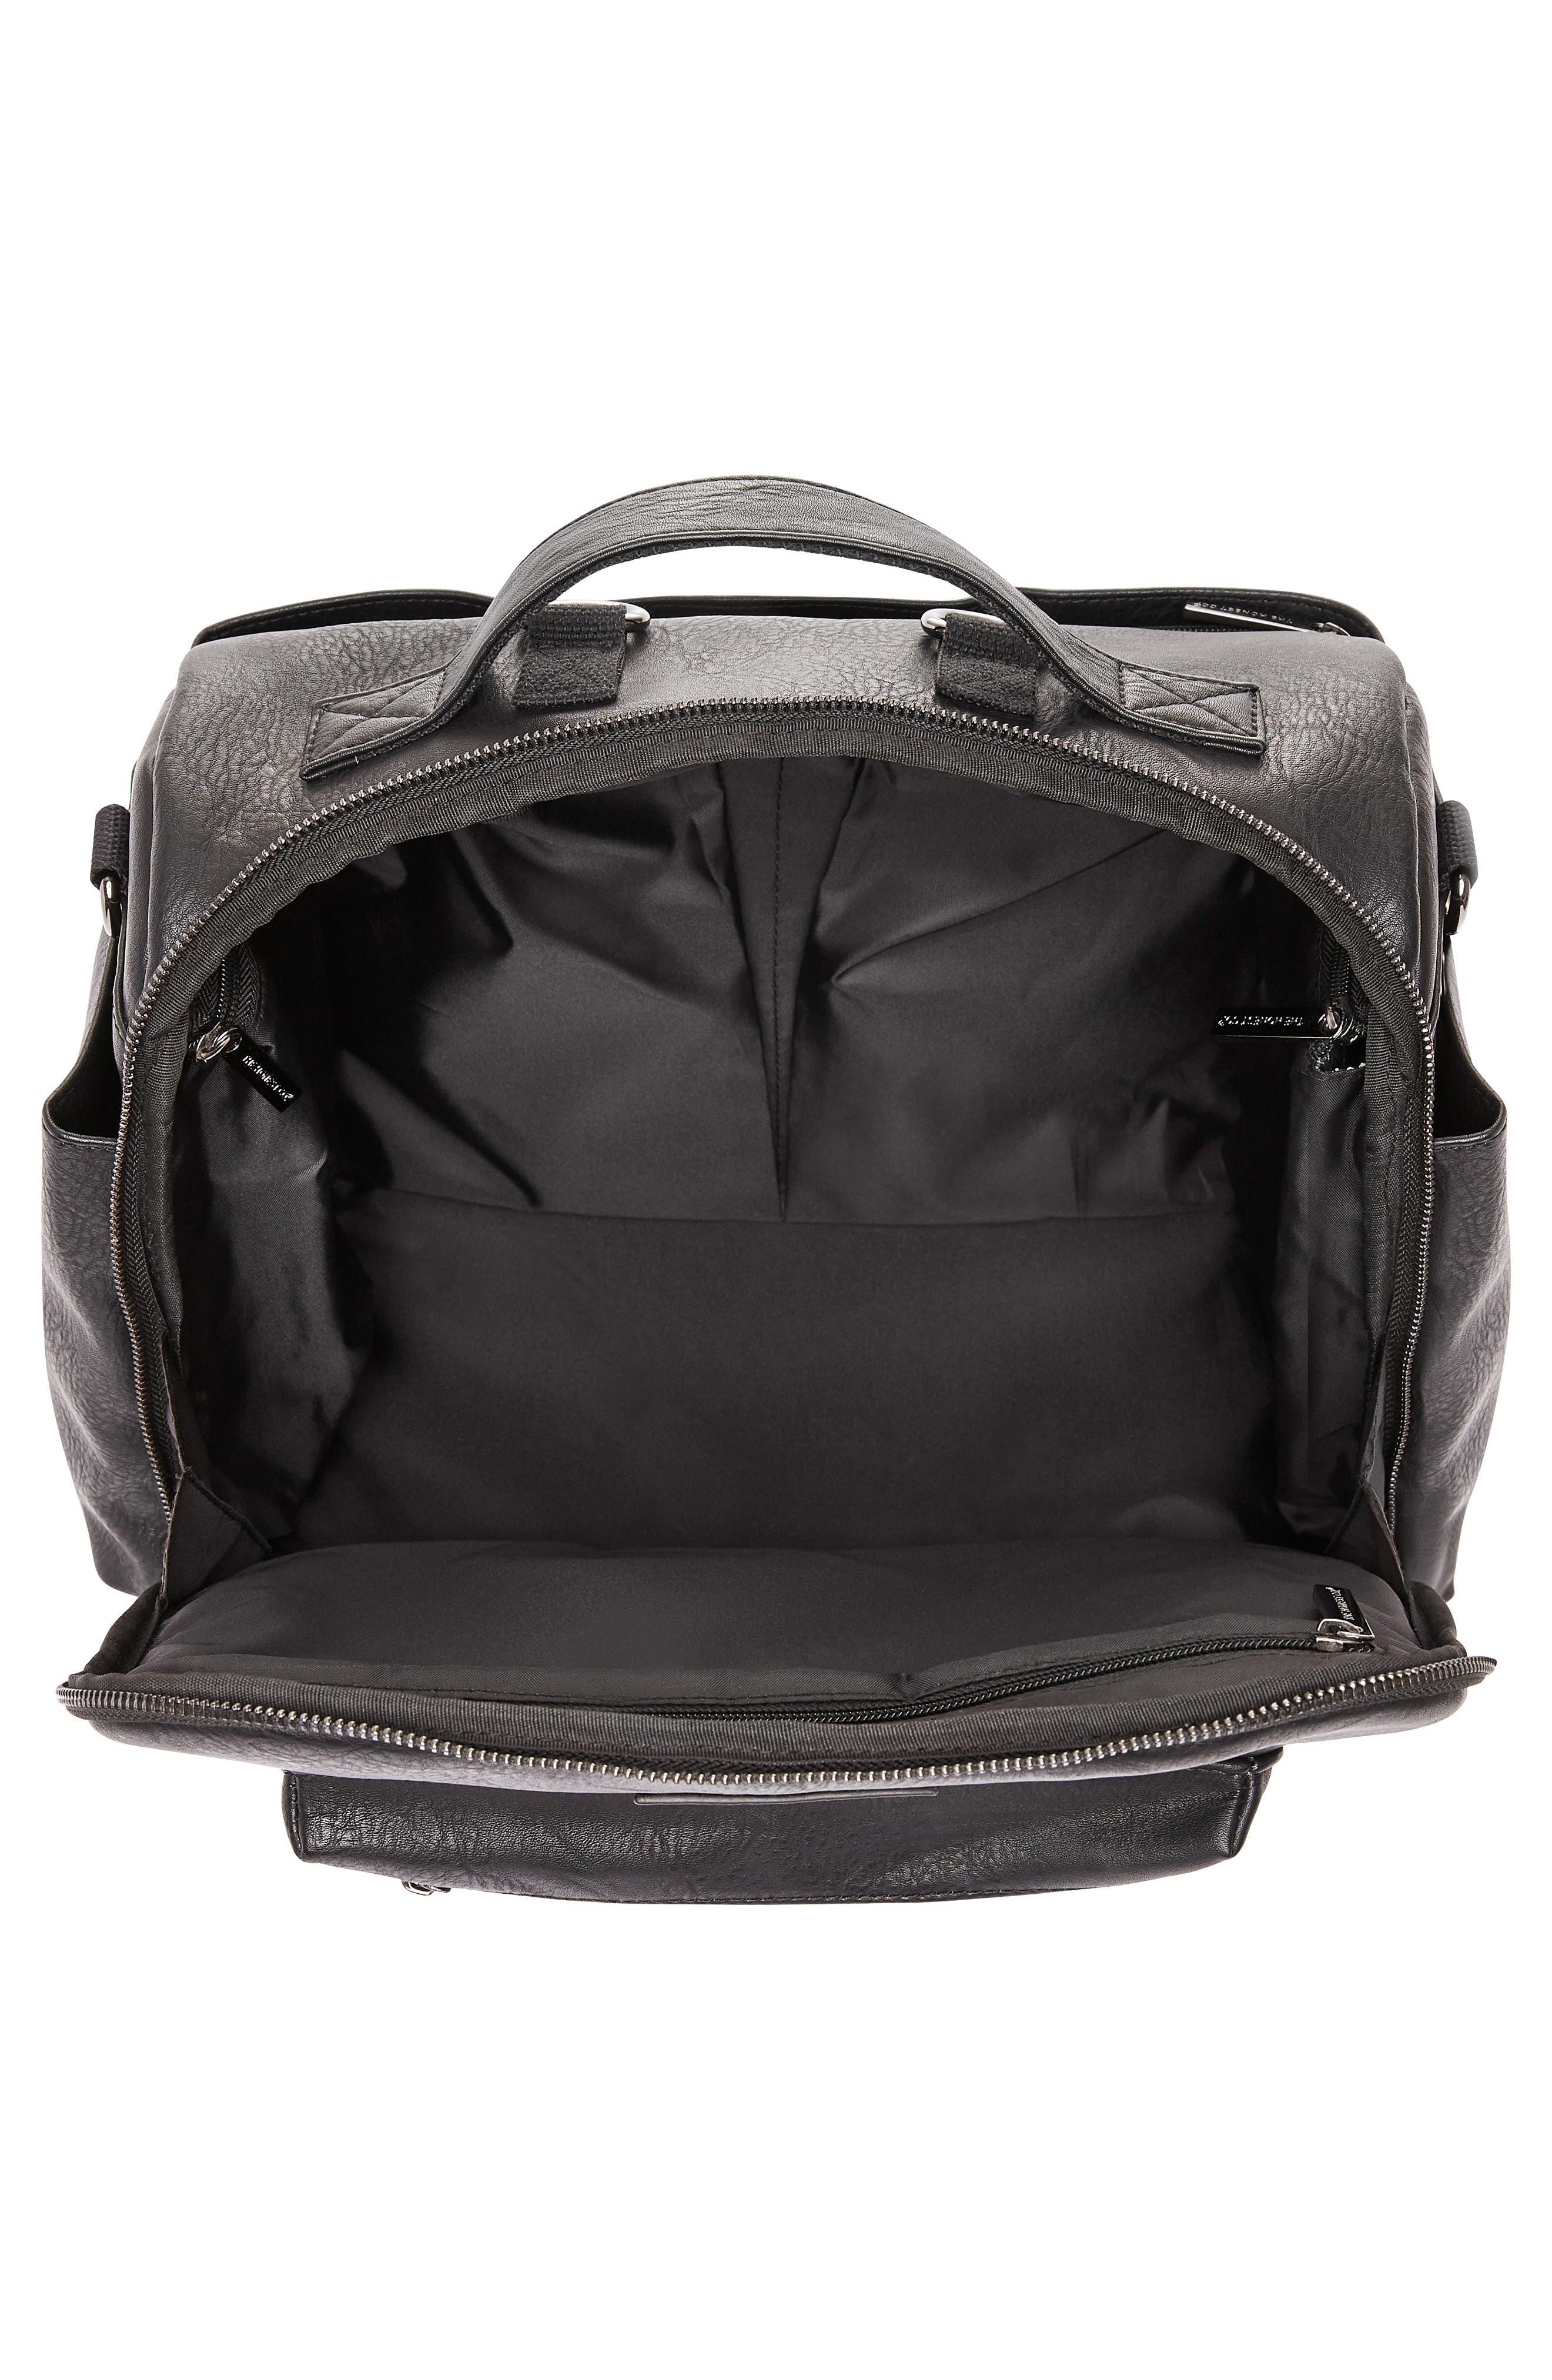 Cross Country Faux Leather Diaper Bag,                             Alternate thumbnail 3, color,                             BLACK